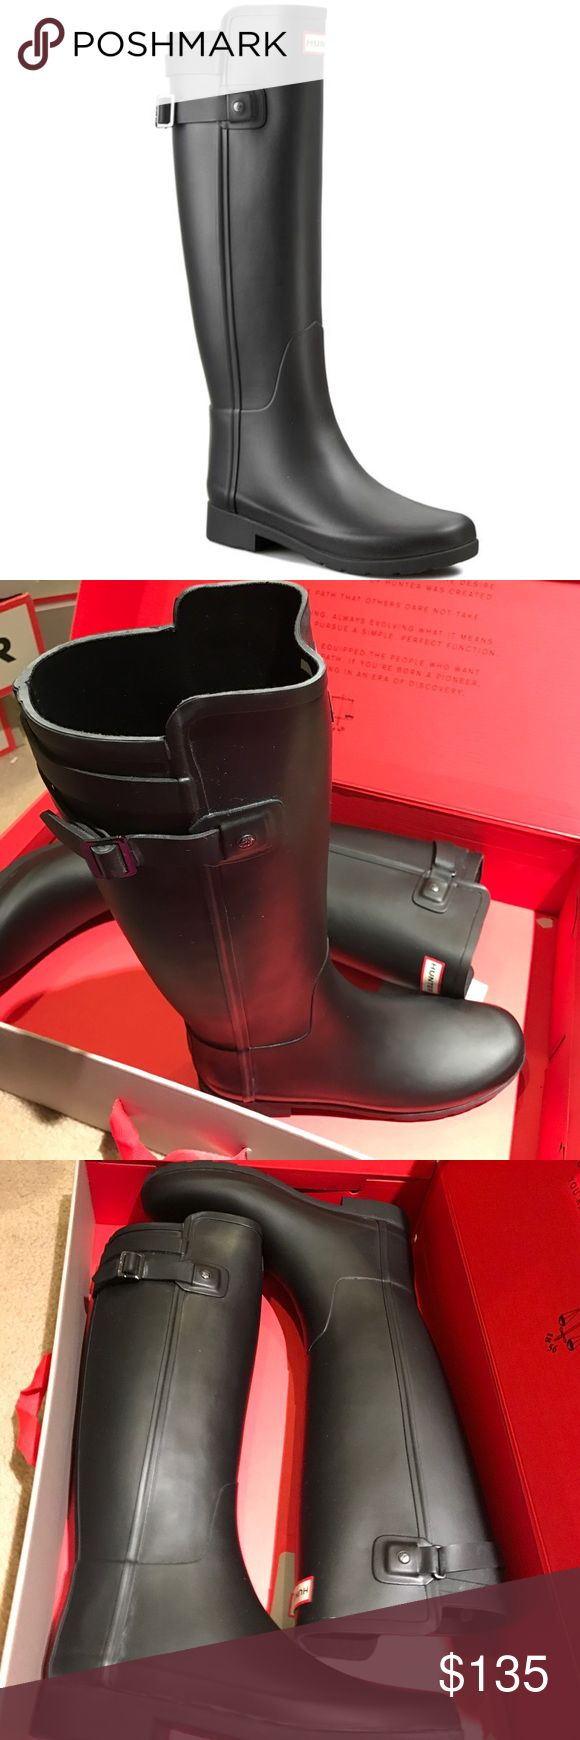 Brand new hunter original tall refined strap boots Brand new in box, hunter boots original tall refined strap black rain boots. Authentic. Hunter Boots Shoes Winter & Rain Boots